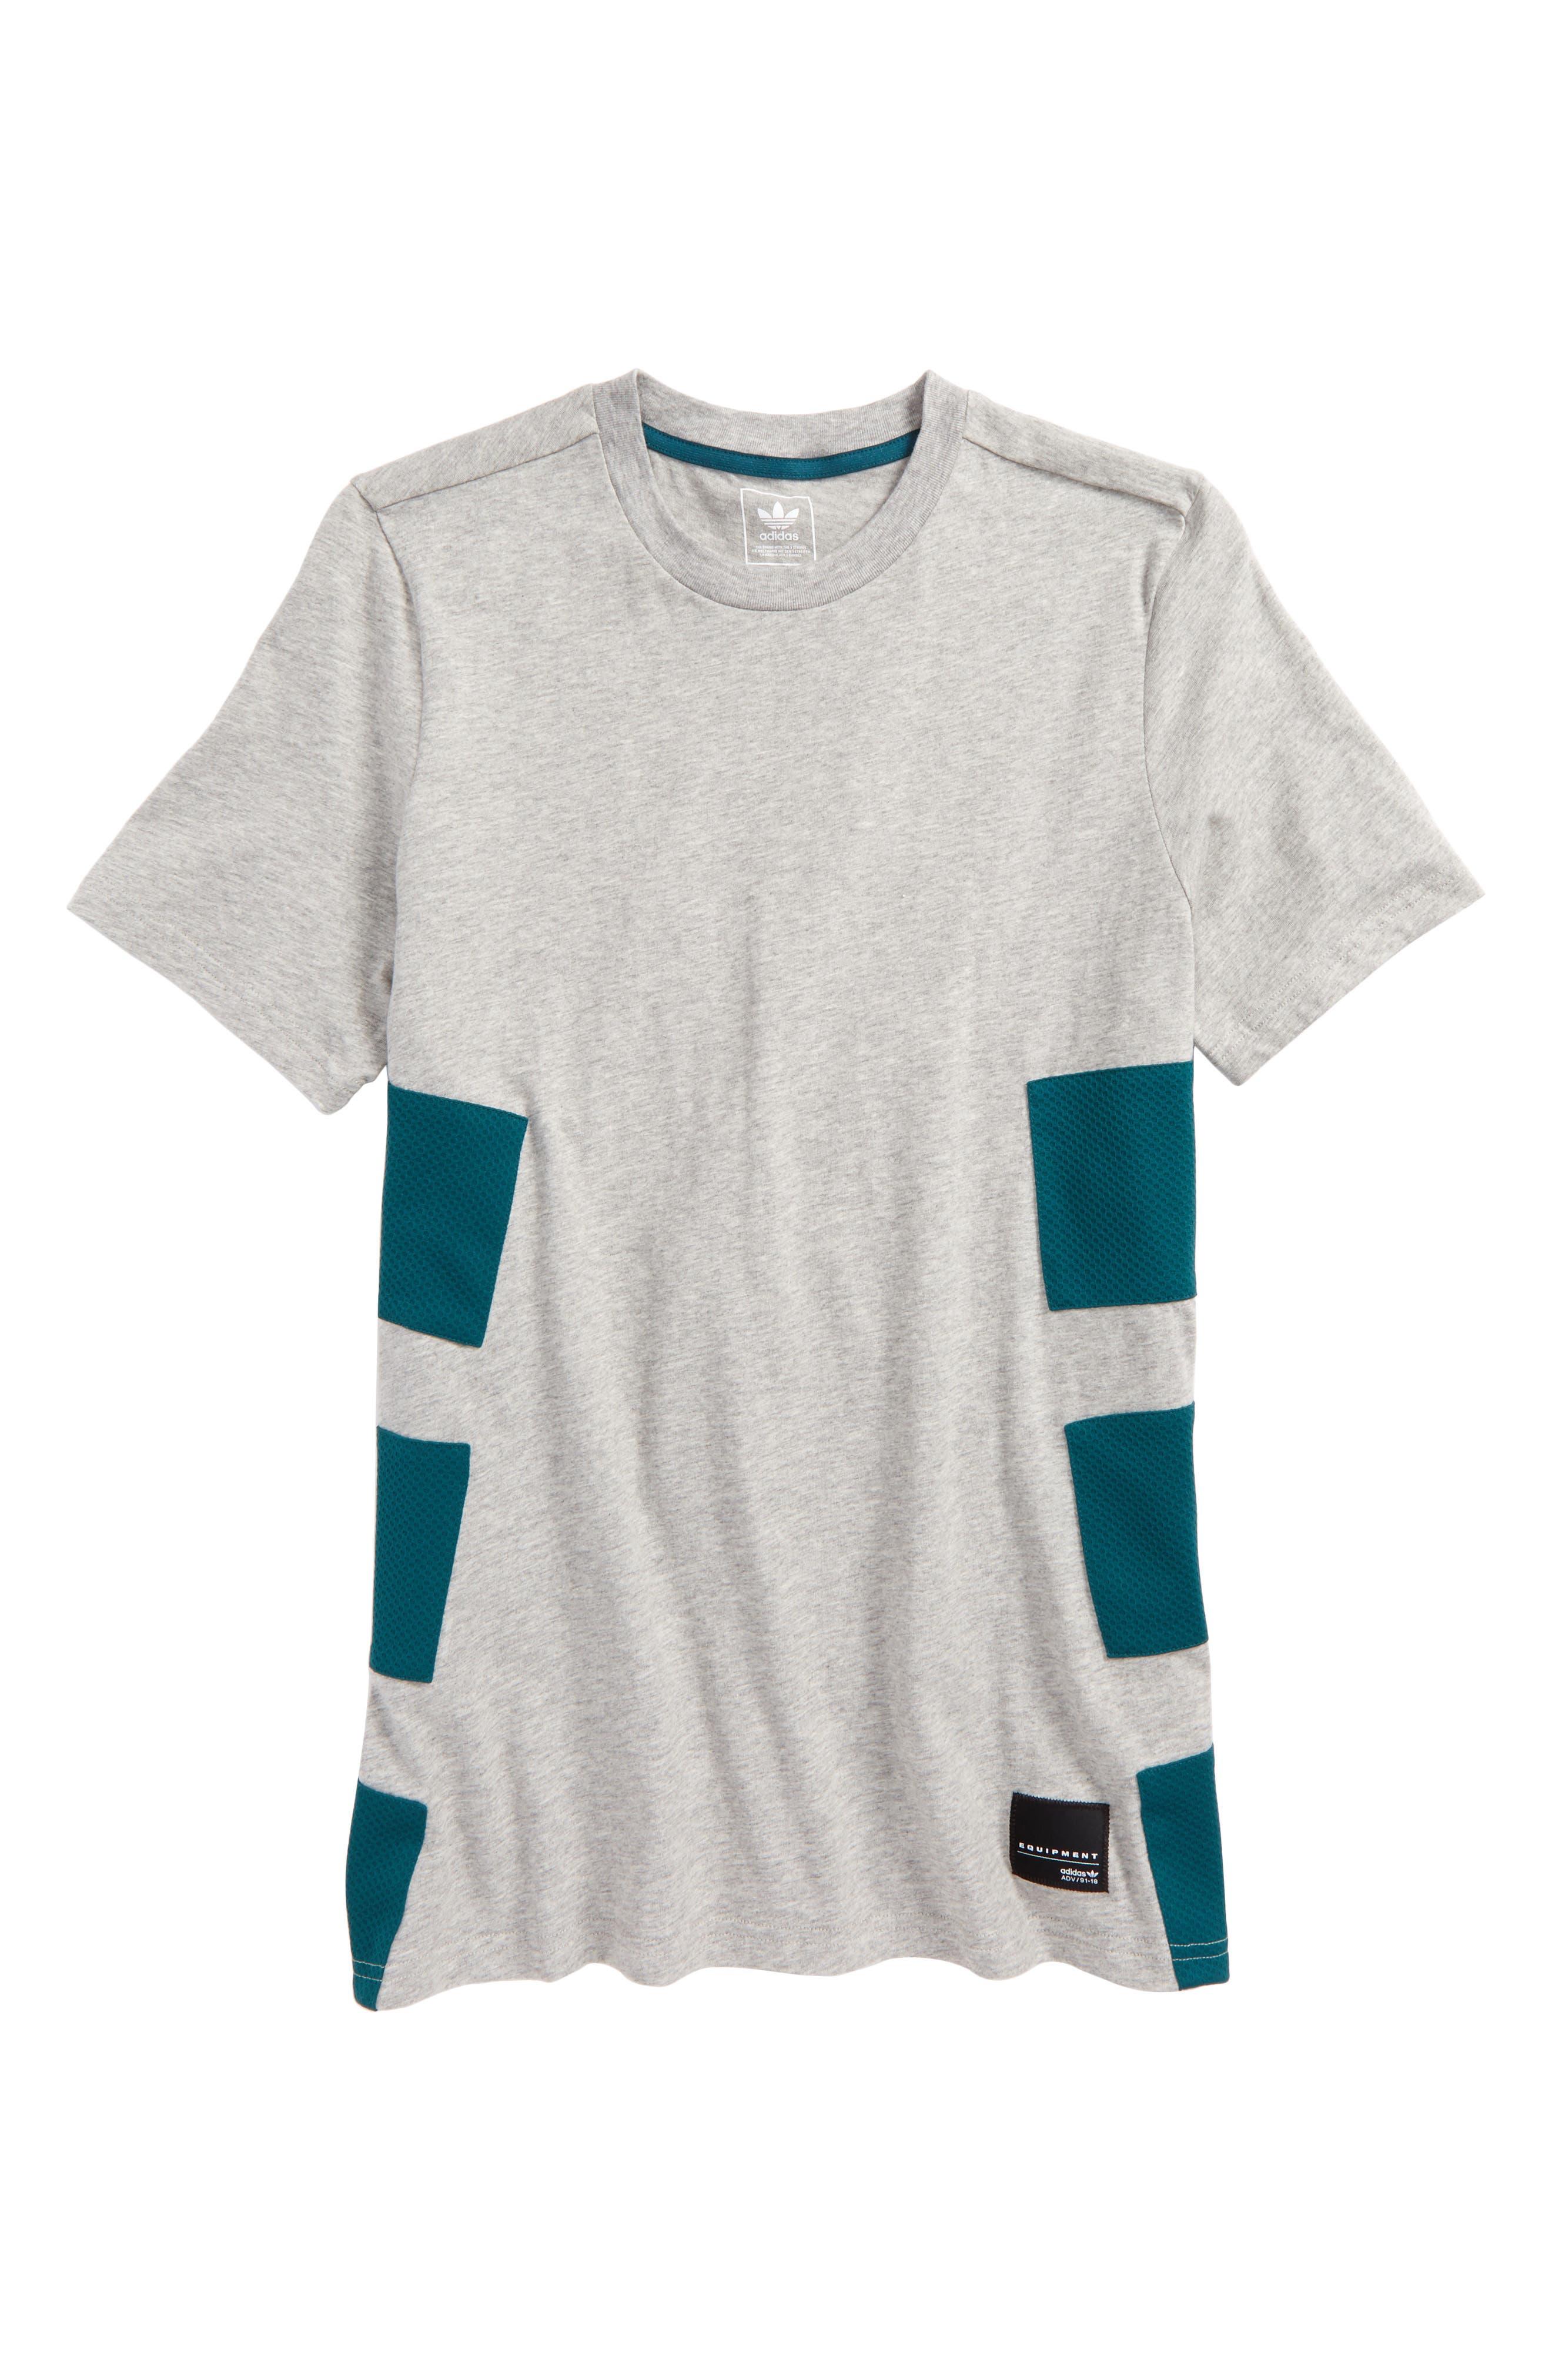 EQT T-Shirt,                         Main,                         color, Grey/ Mystery Green